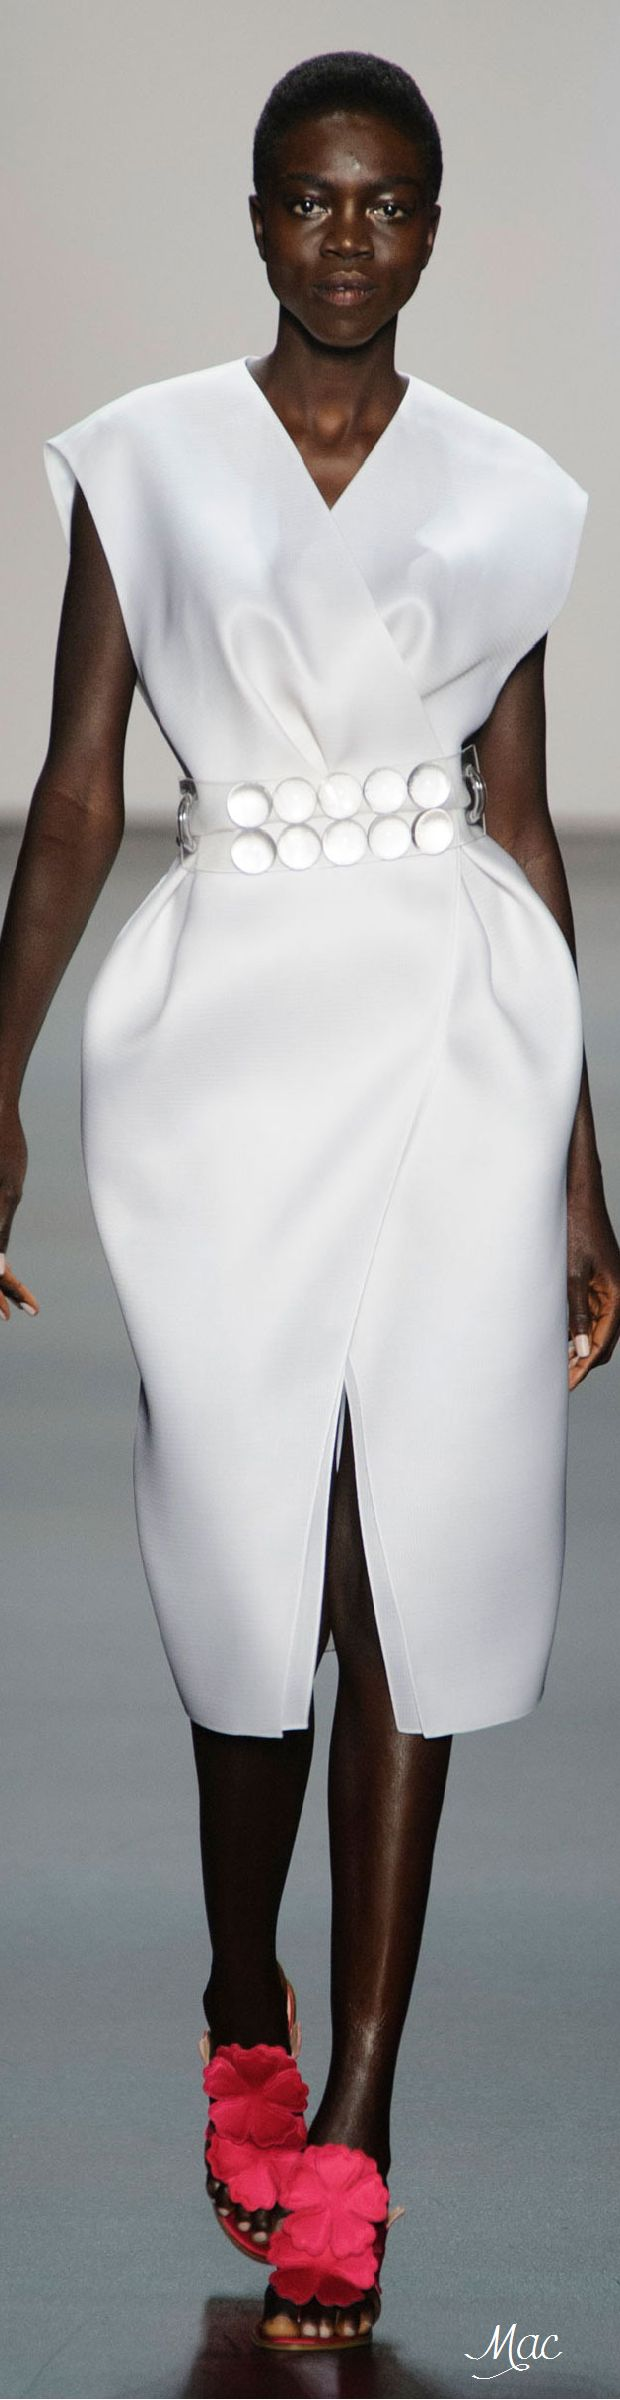 Spring 2016 Ready-to-Wear Angel Sanchez работа, девушка, рубеж, австралия, турция, сша, америка, граница http://escort-journal.com/